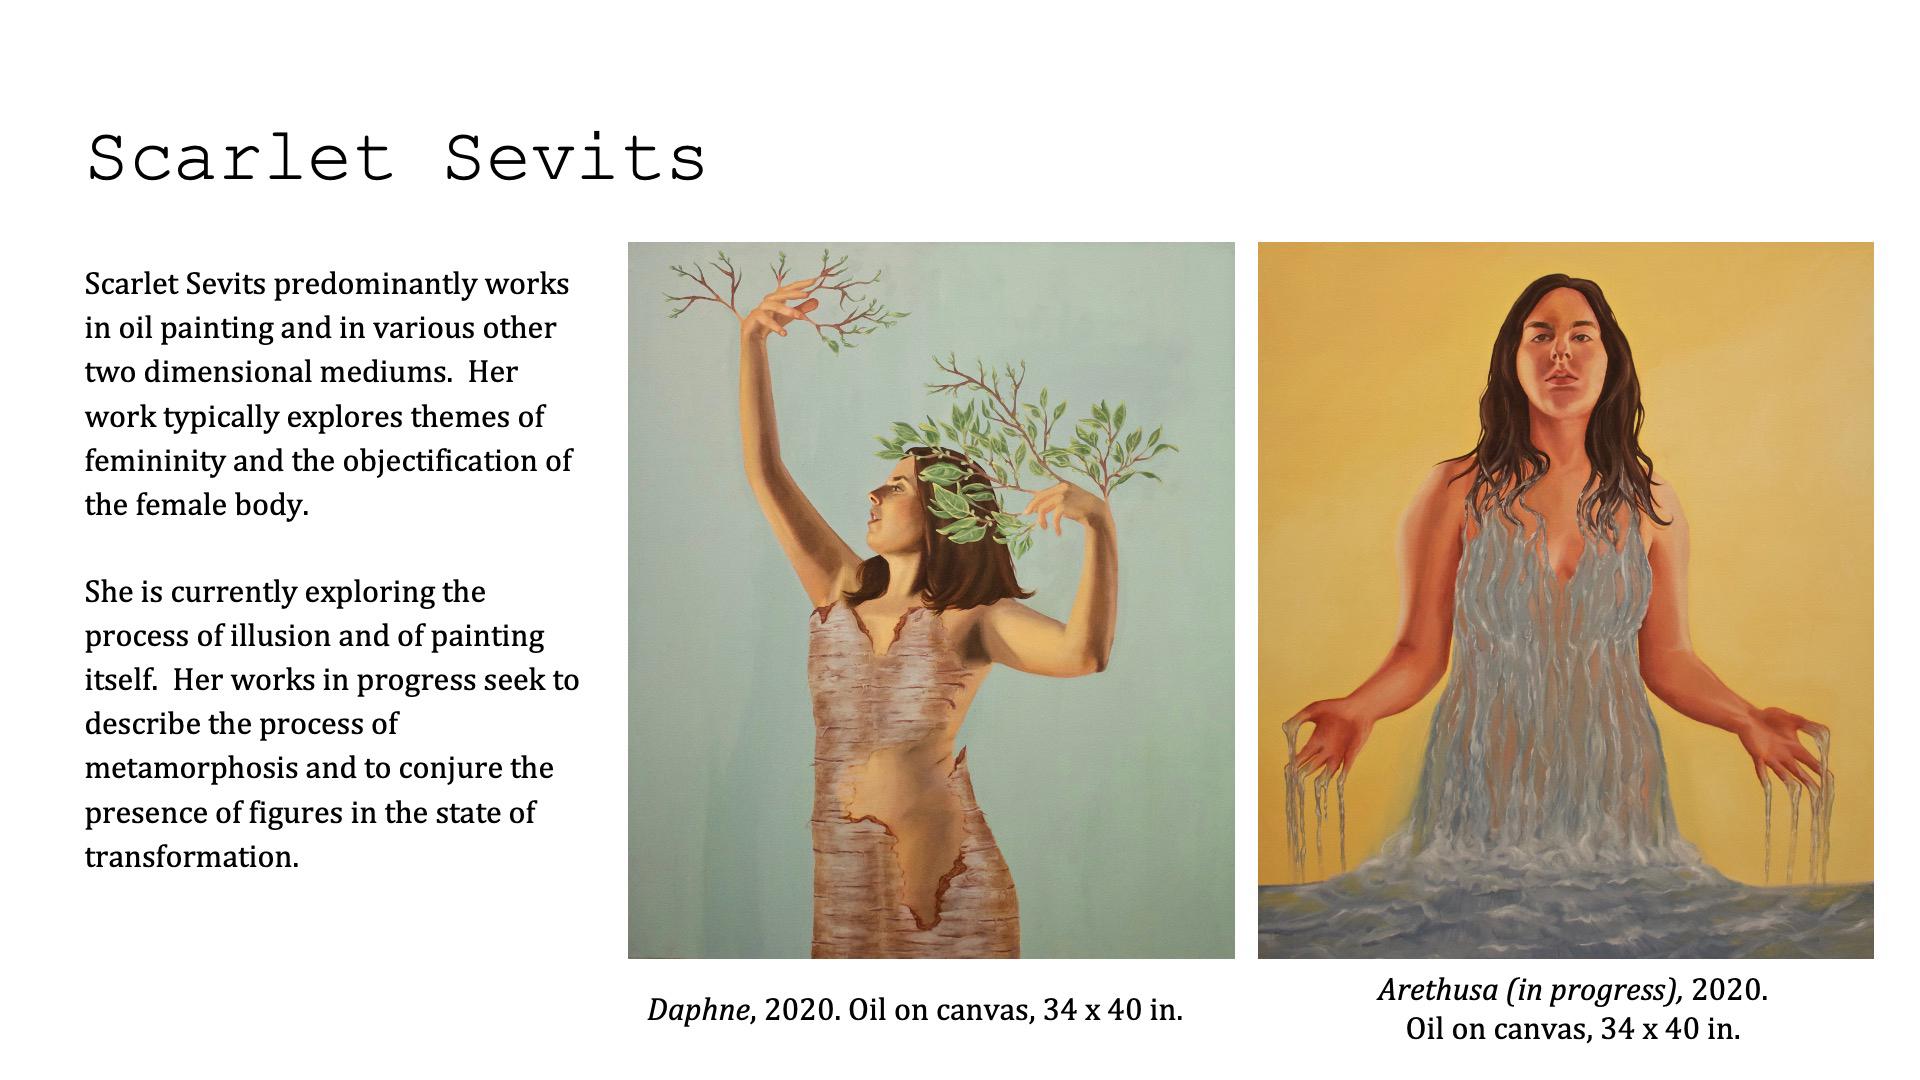 Scarlet Sevits, Daphne / Arethusa